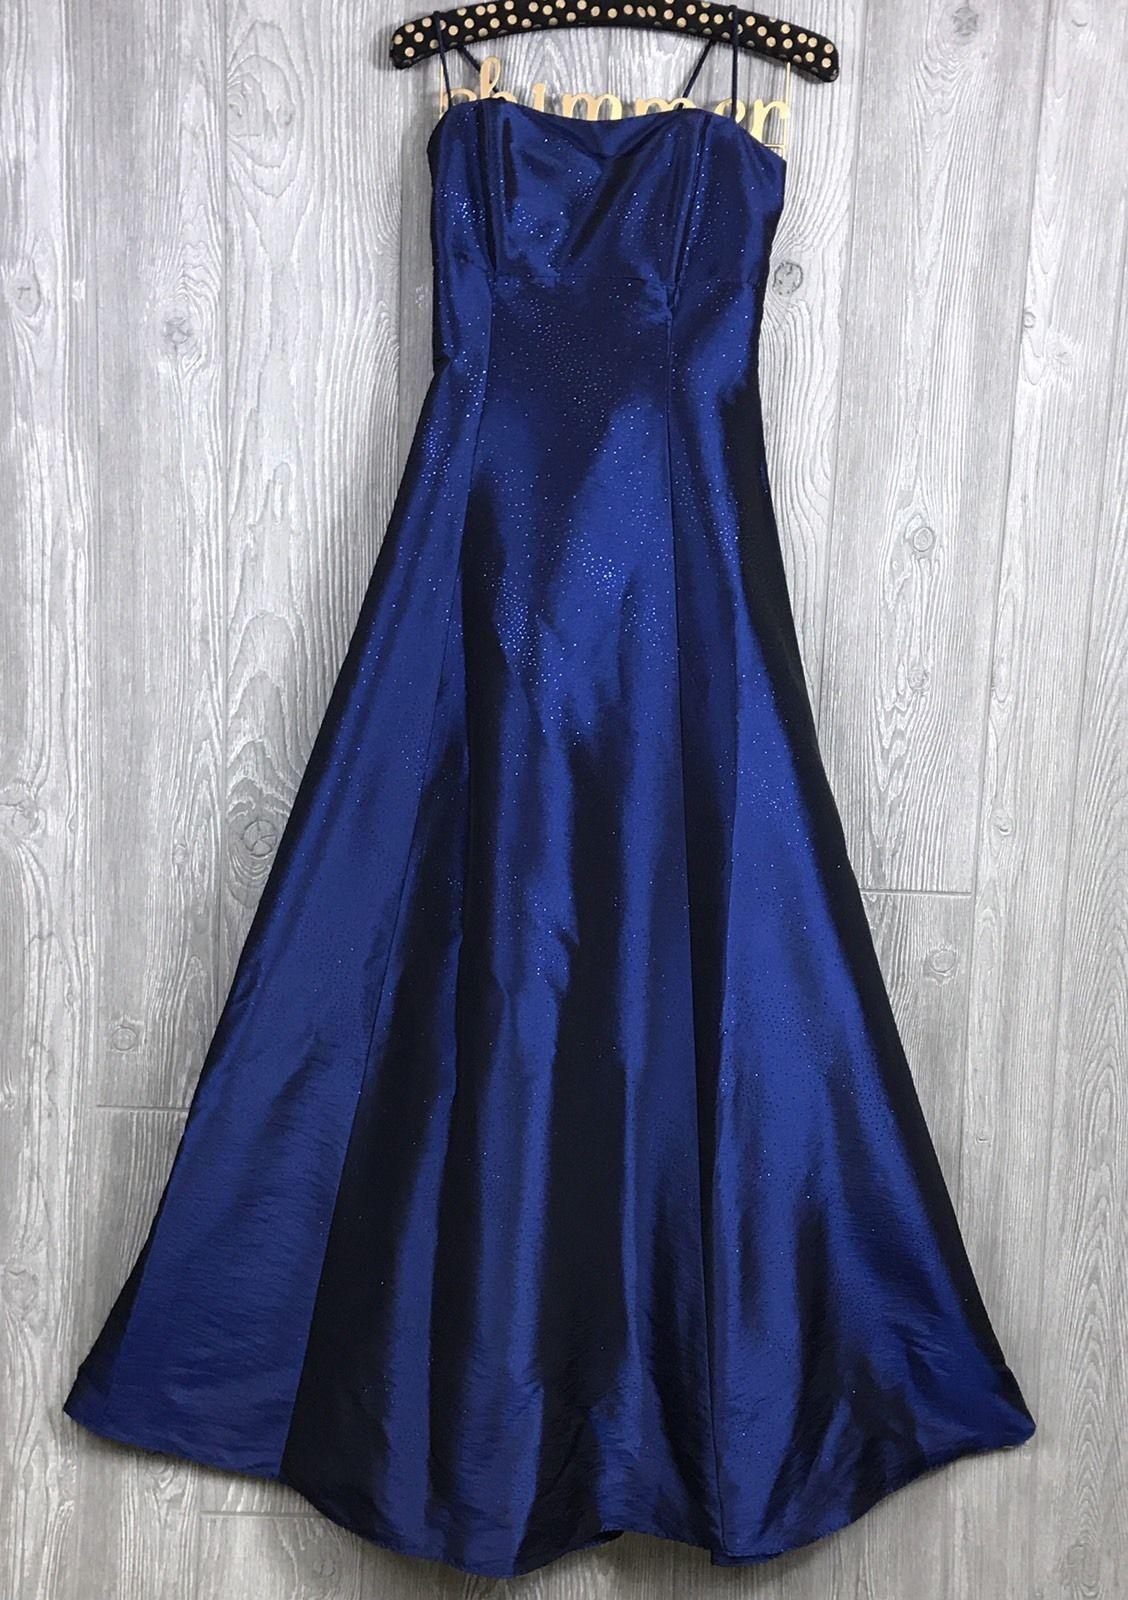 Awesome awesome zum zum prom dress midnight summer dream blue